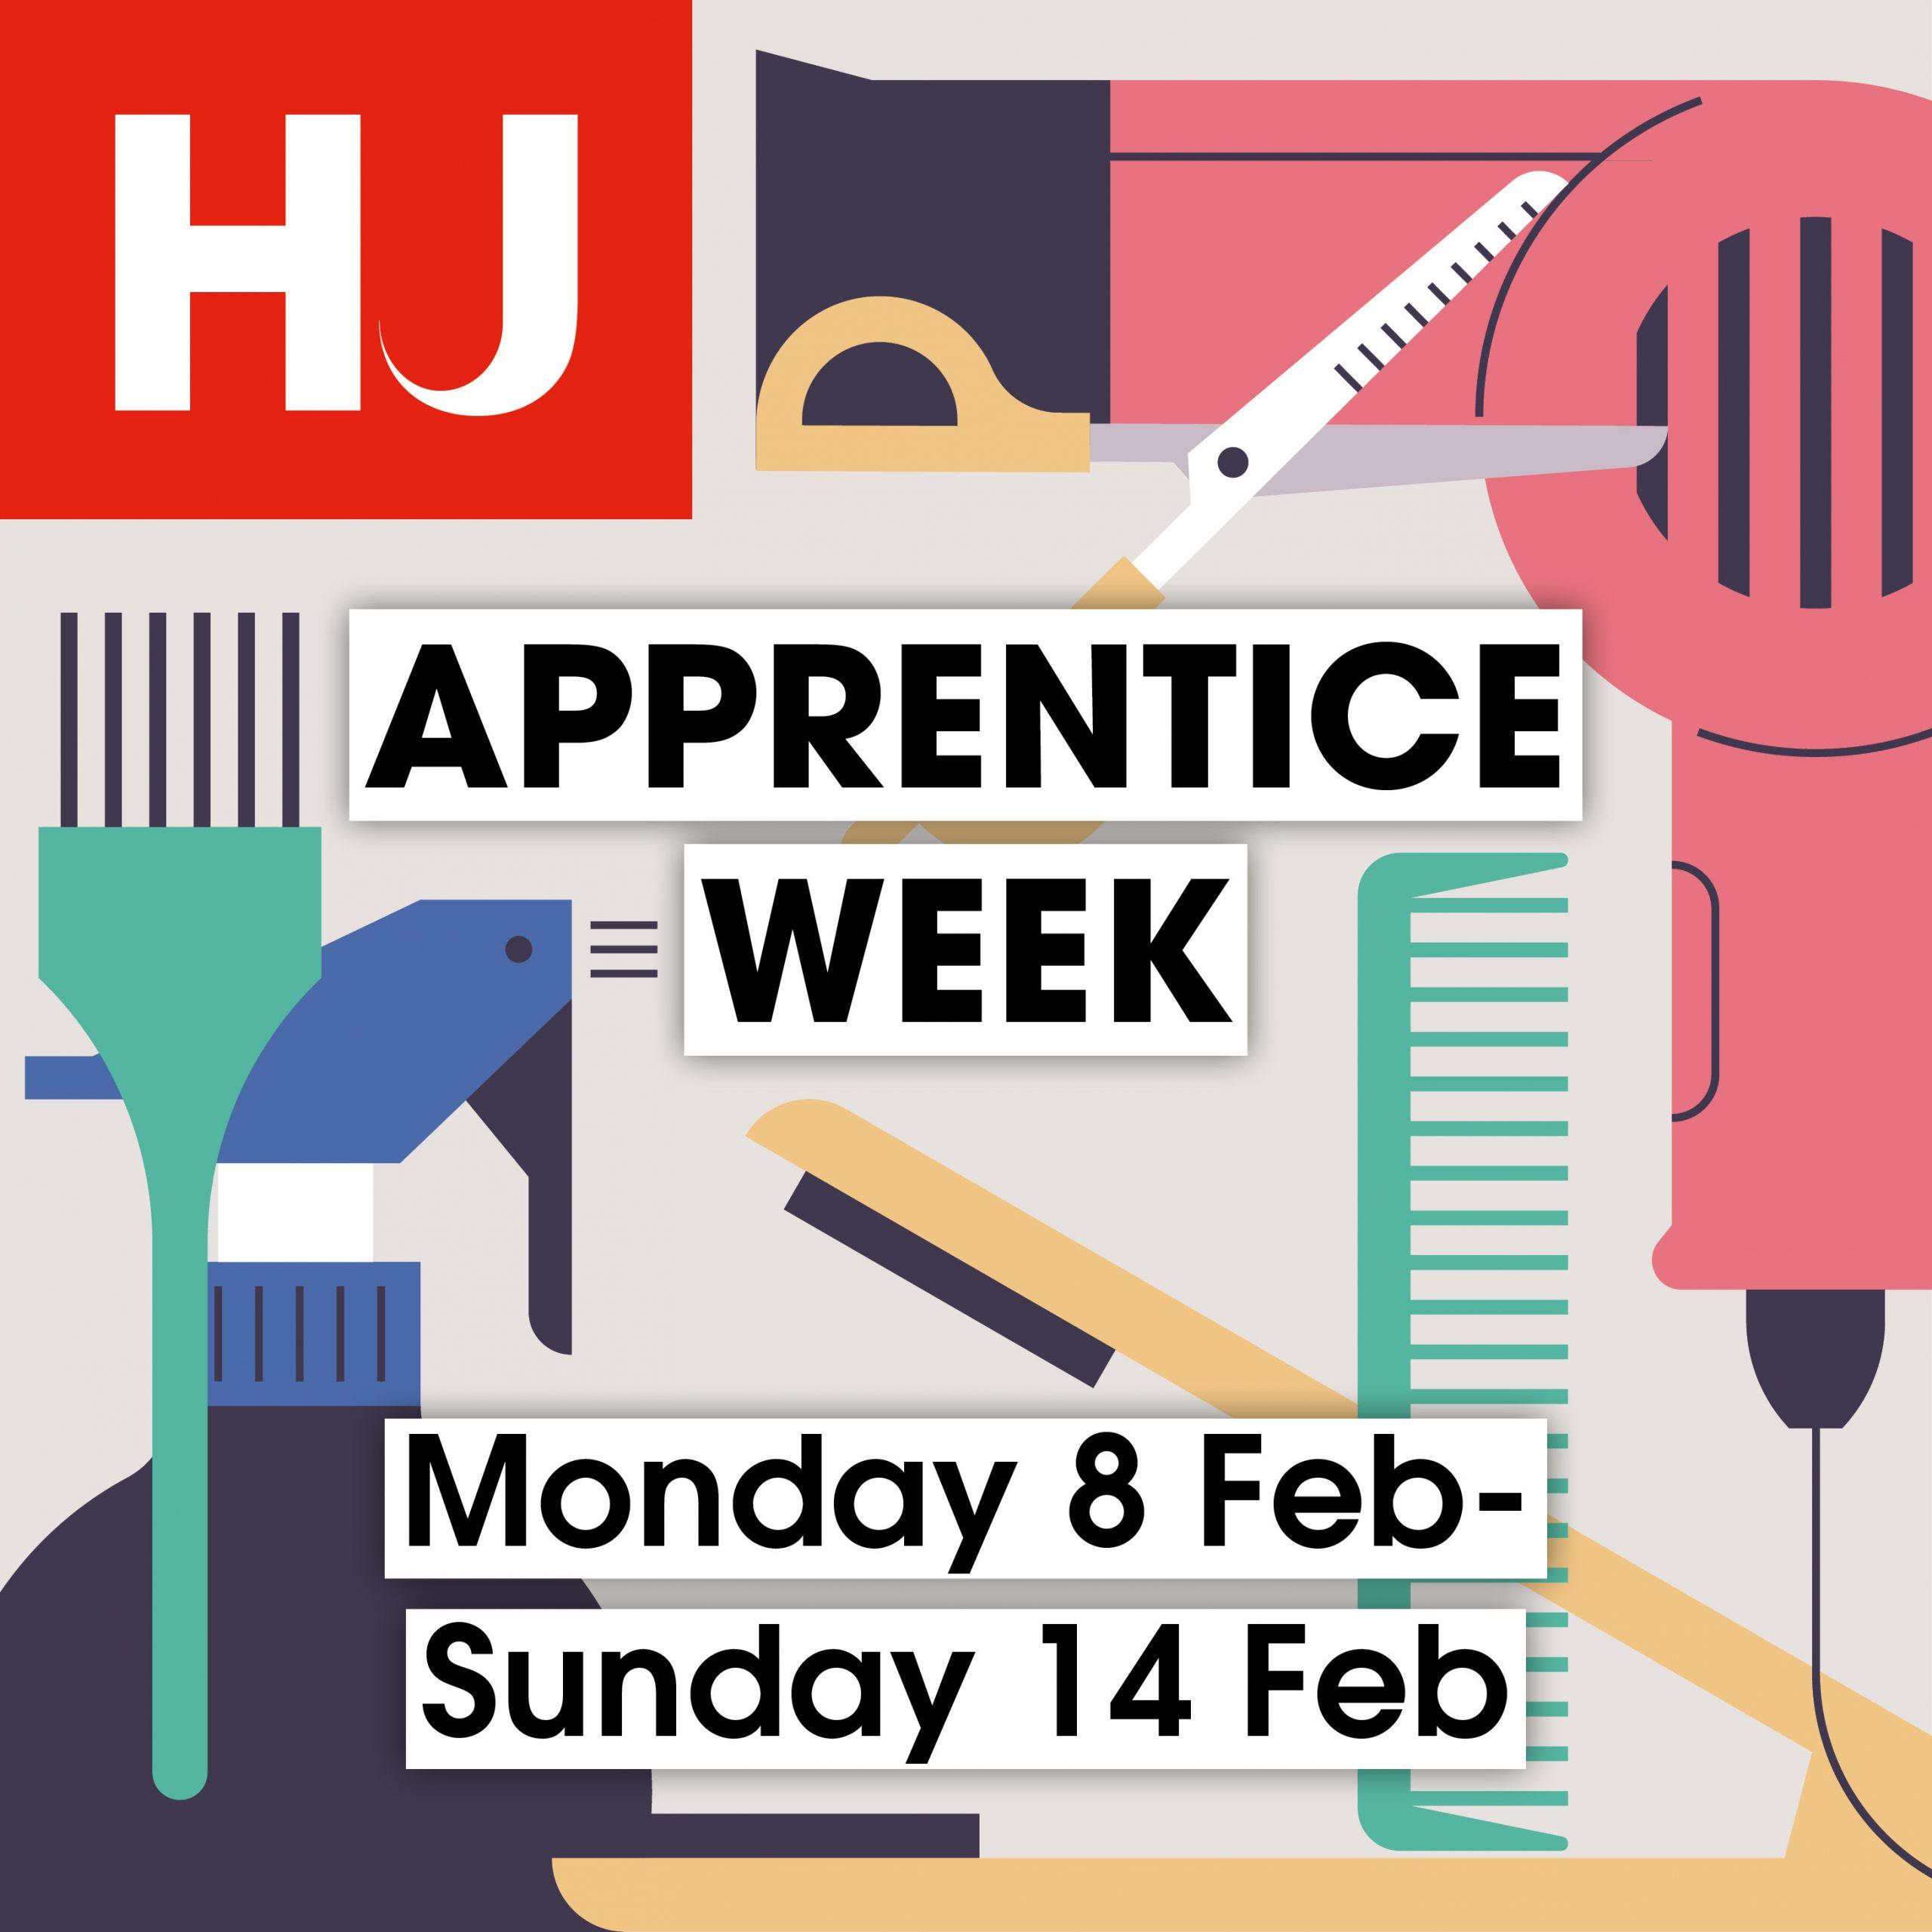 HJ Apprentice Week 2021